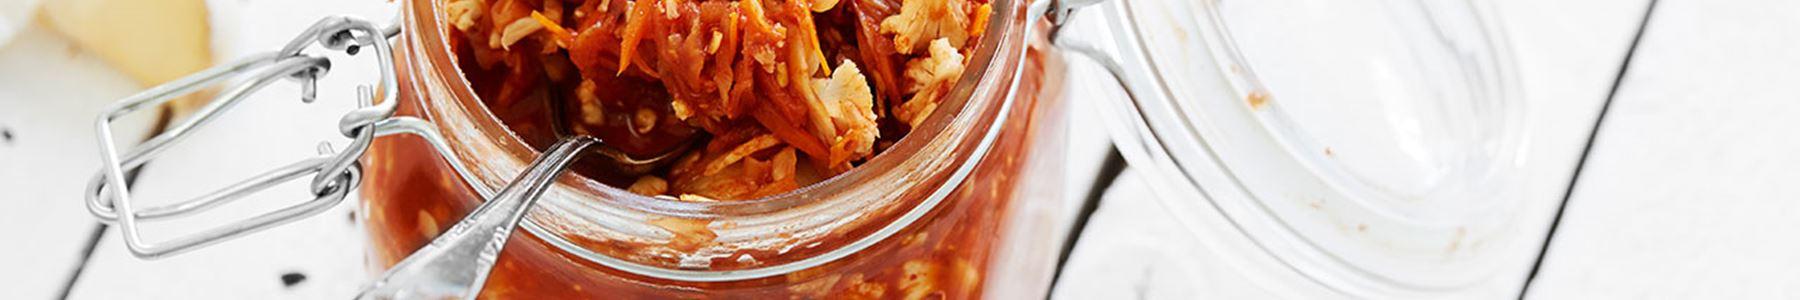 GI-metoden + Kimchi